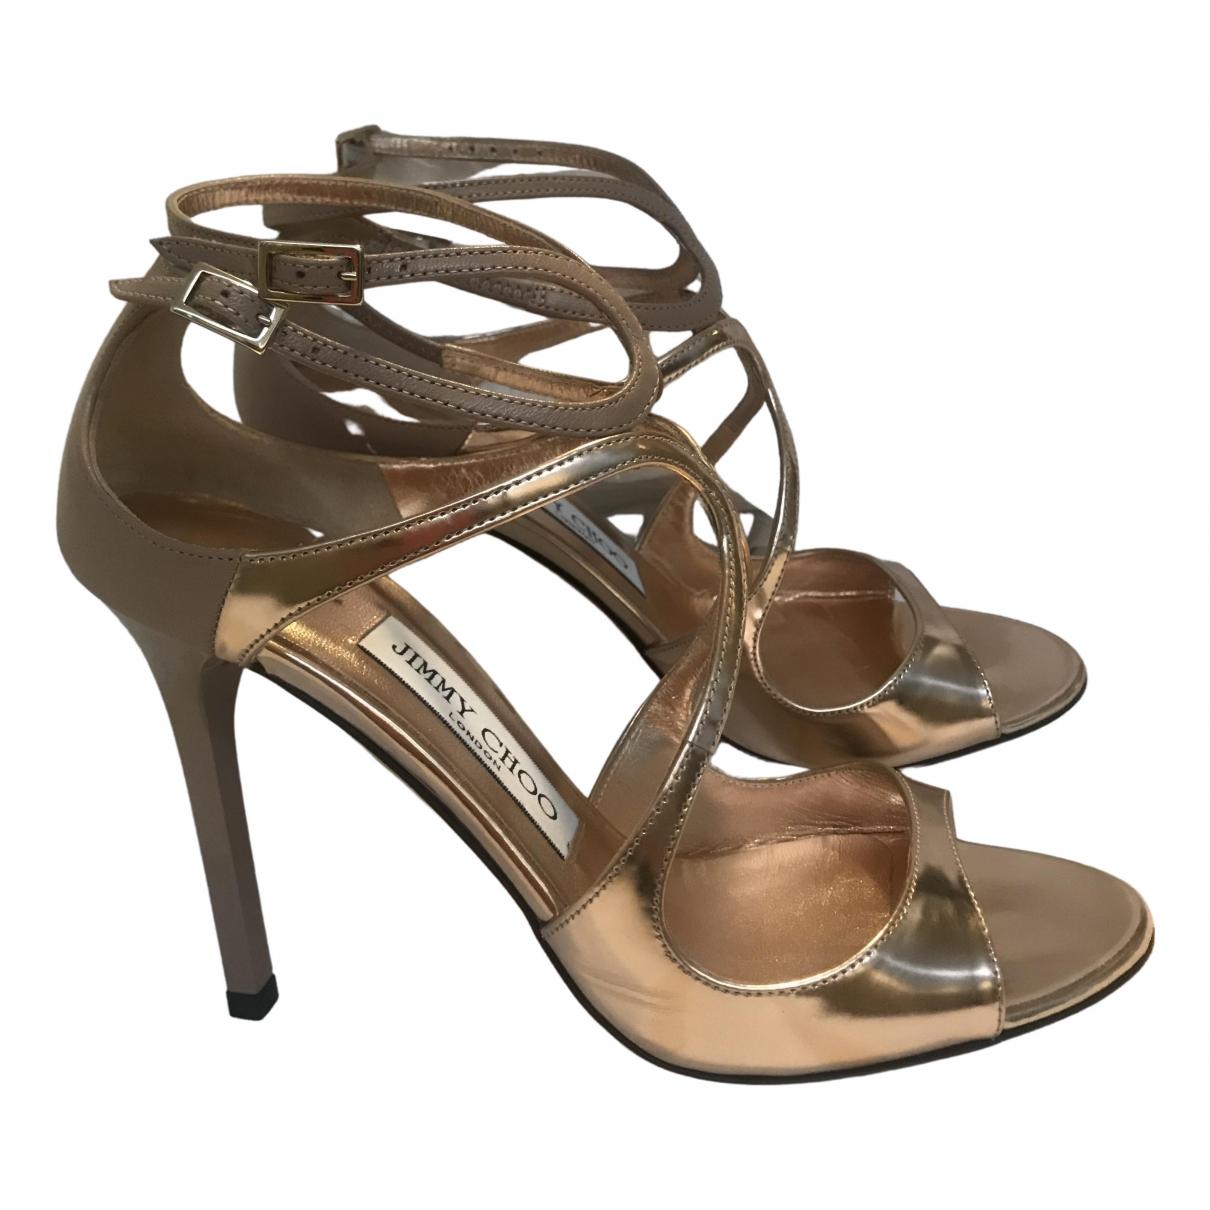 Jimmy Choo \N Metallic Leather Heels for Women 37 EU